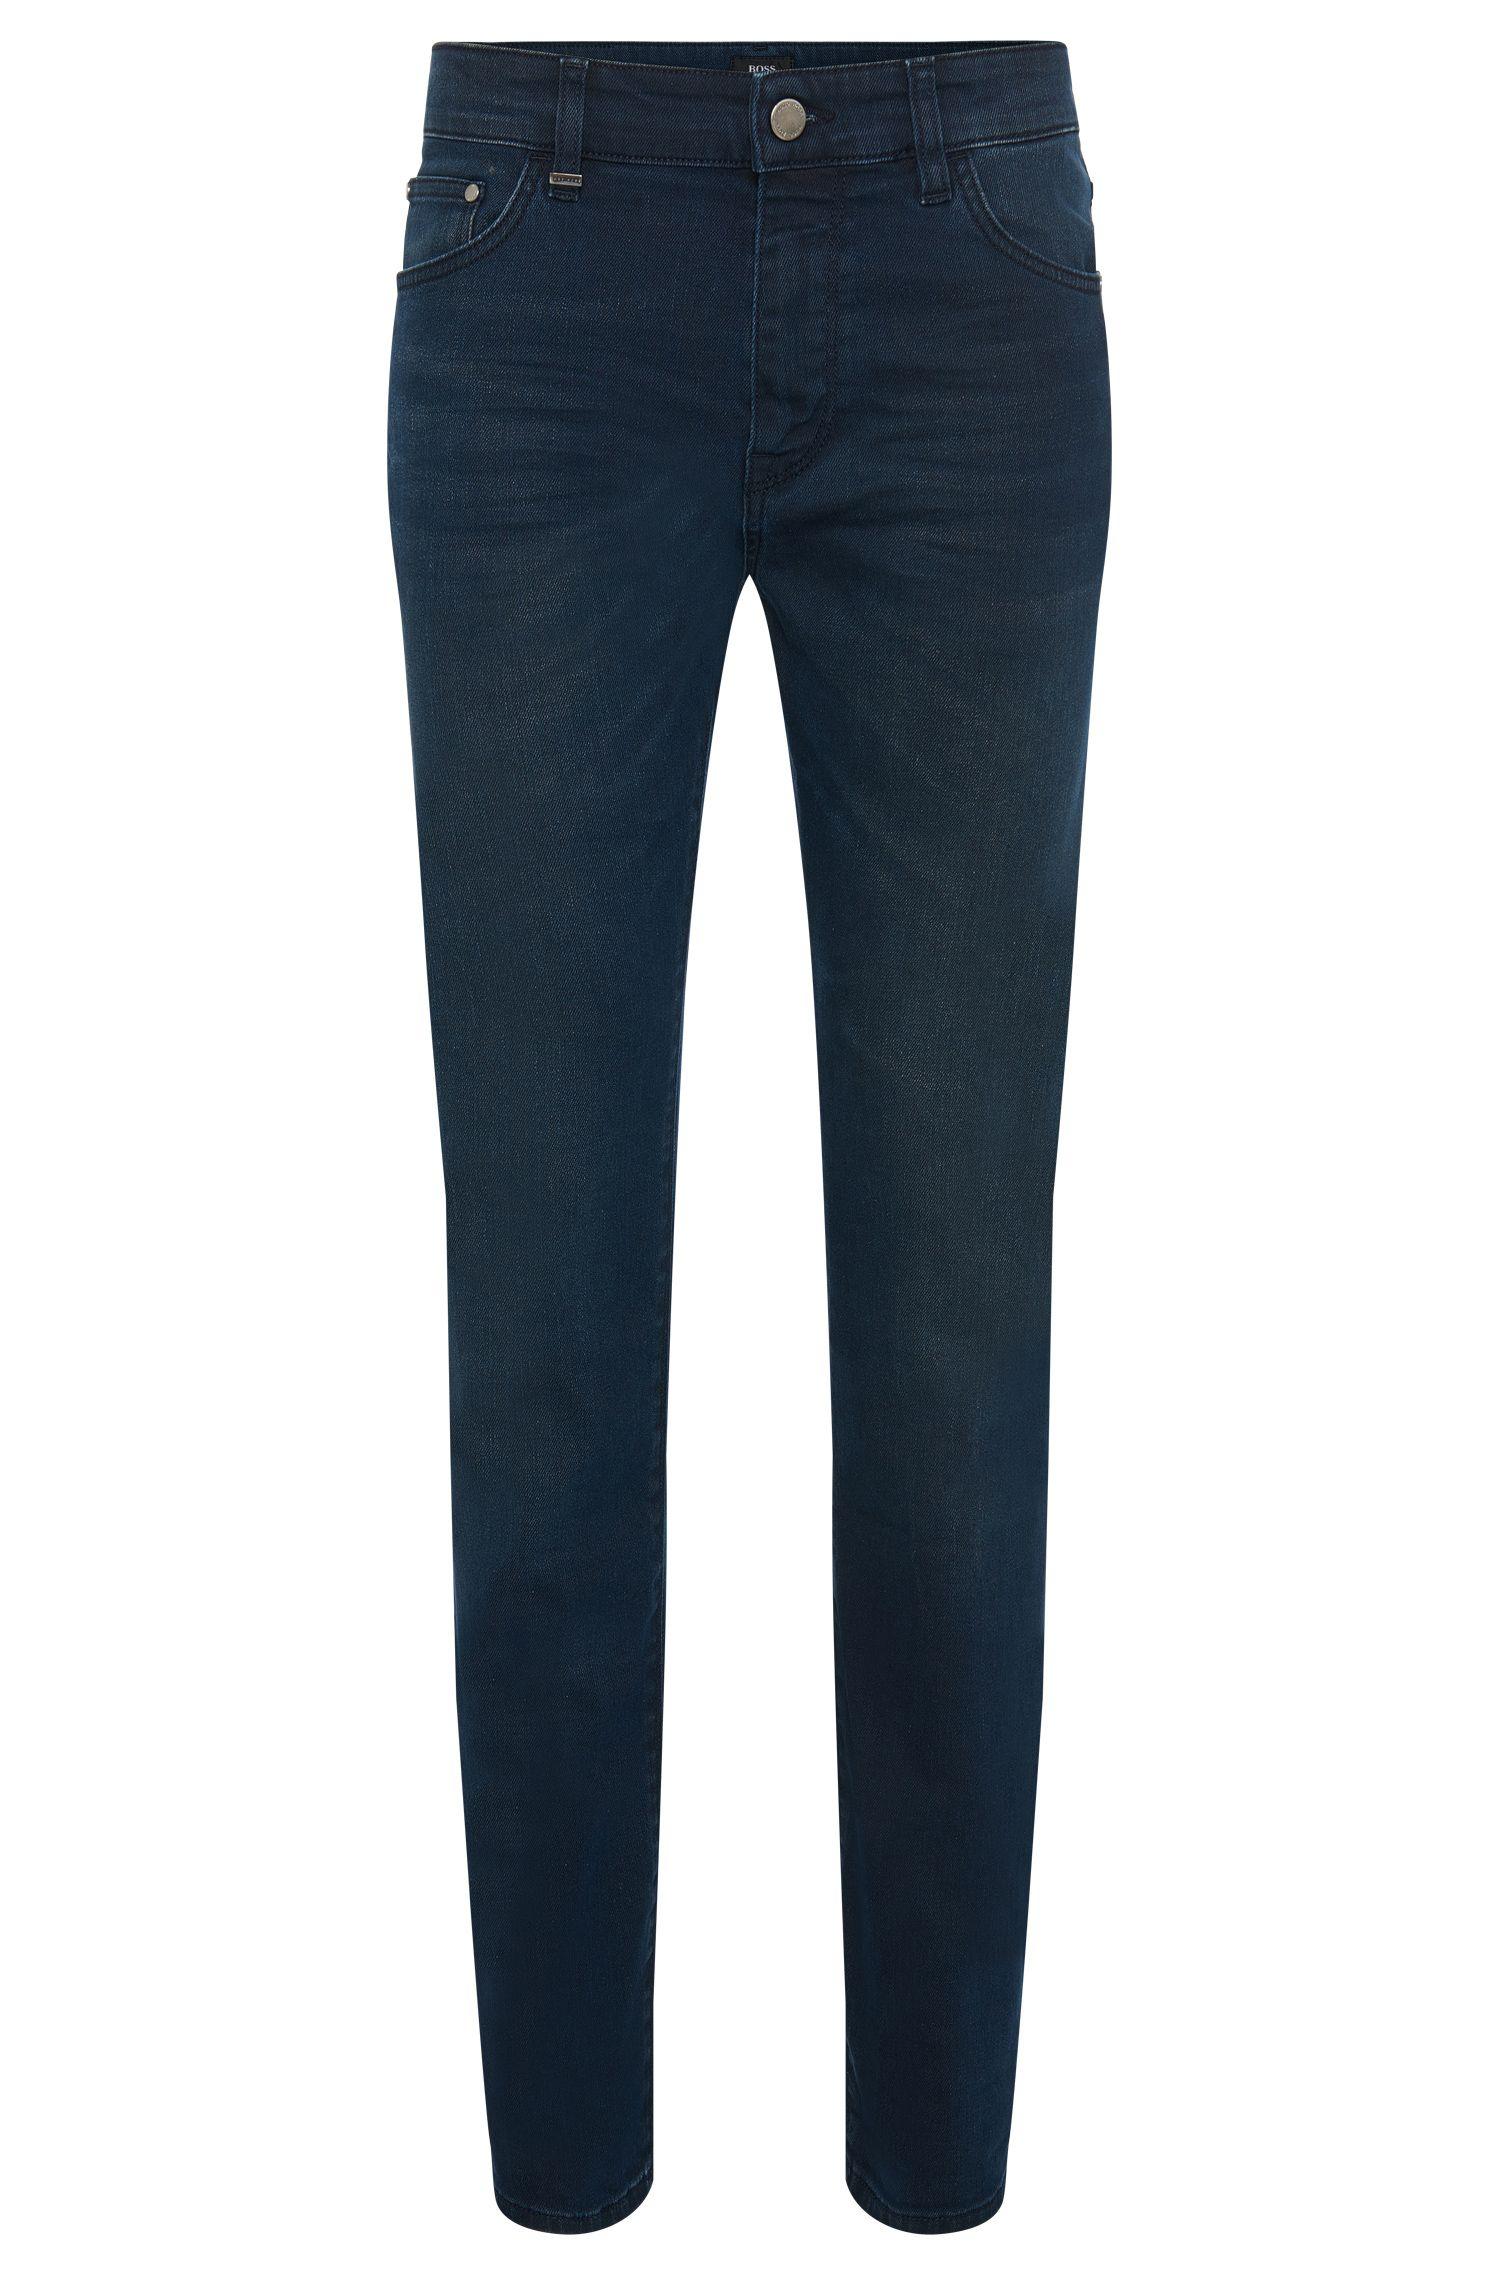 'Maine' | Regular Fit, 10 oz Stretch Cotton Blend Jeans